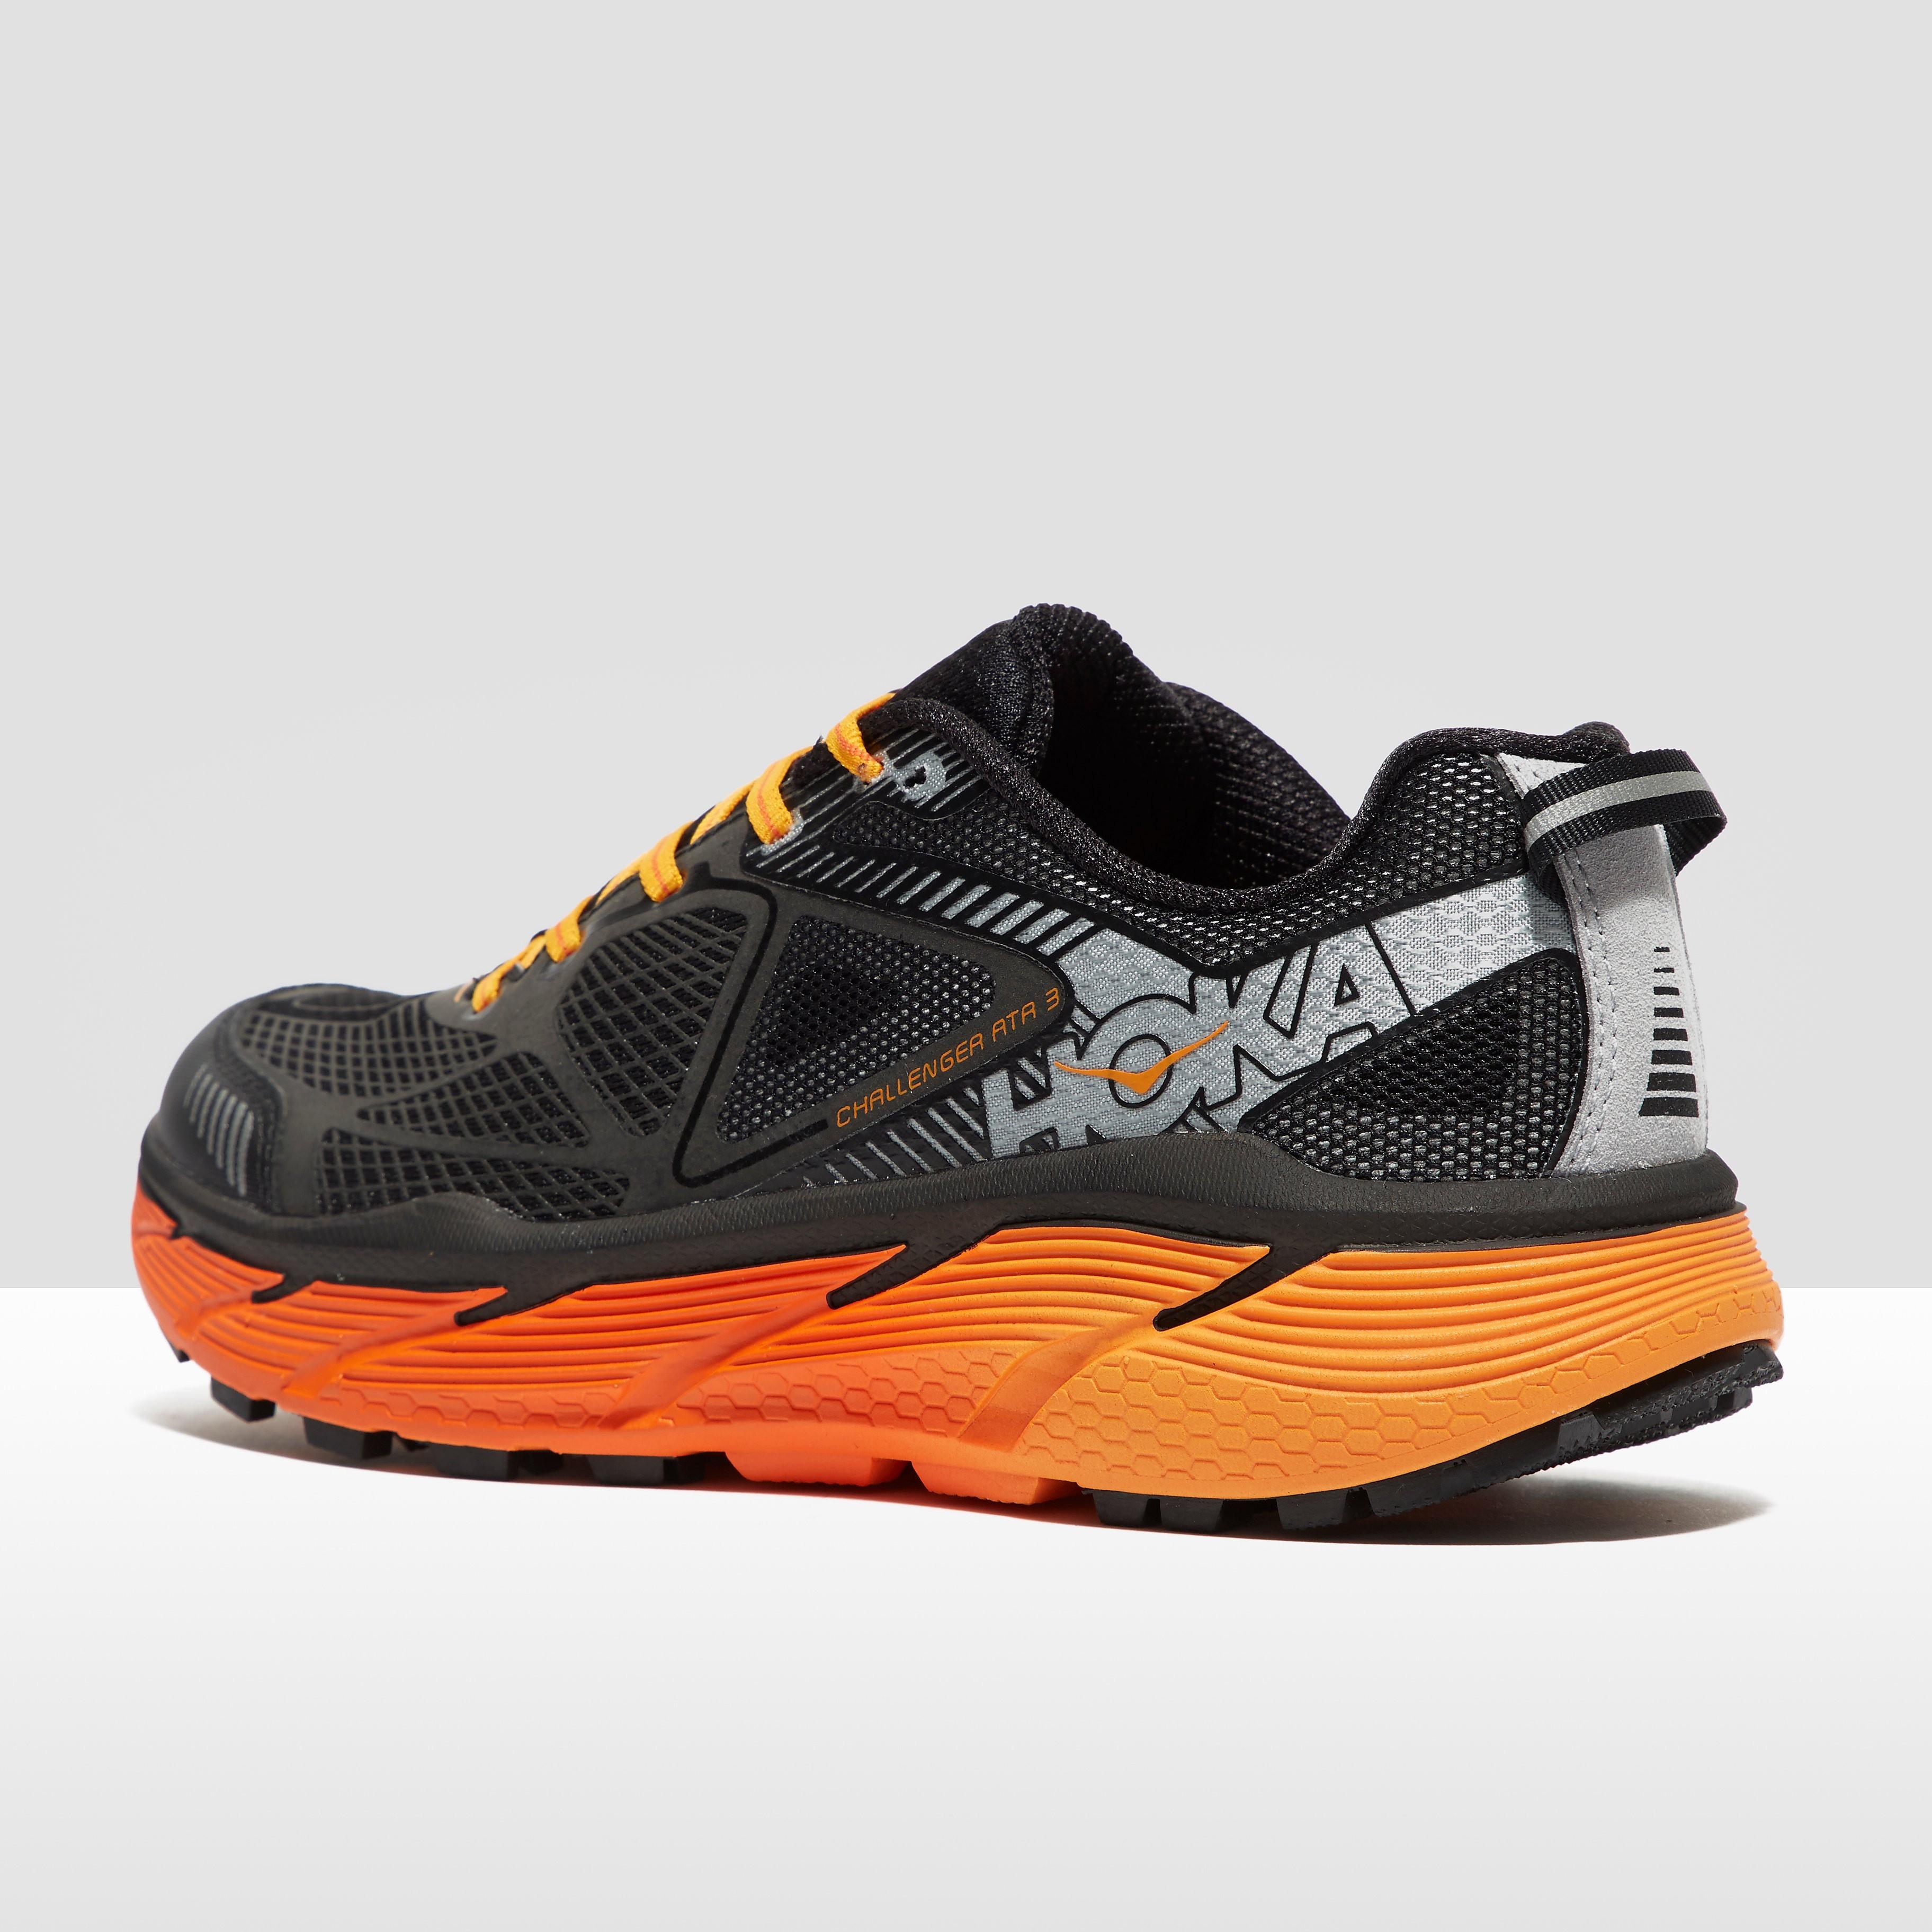 Hoka One One Challenger ATR 3 Men's Running Shoes